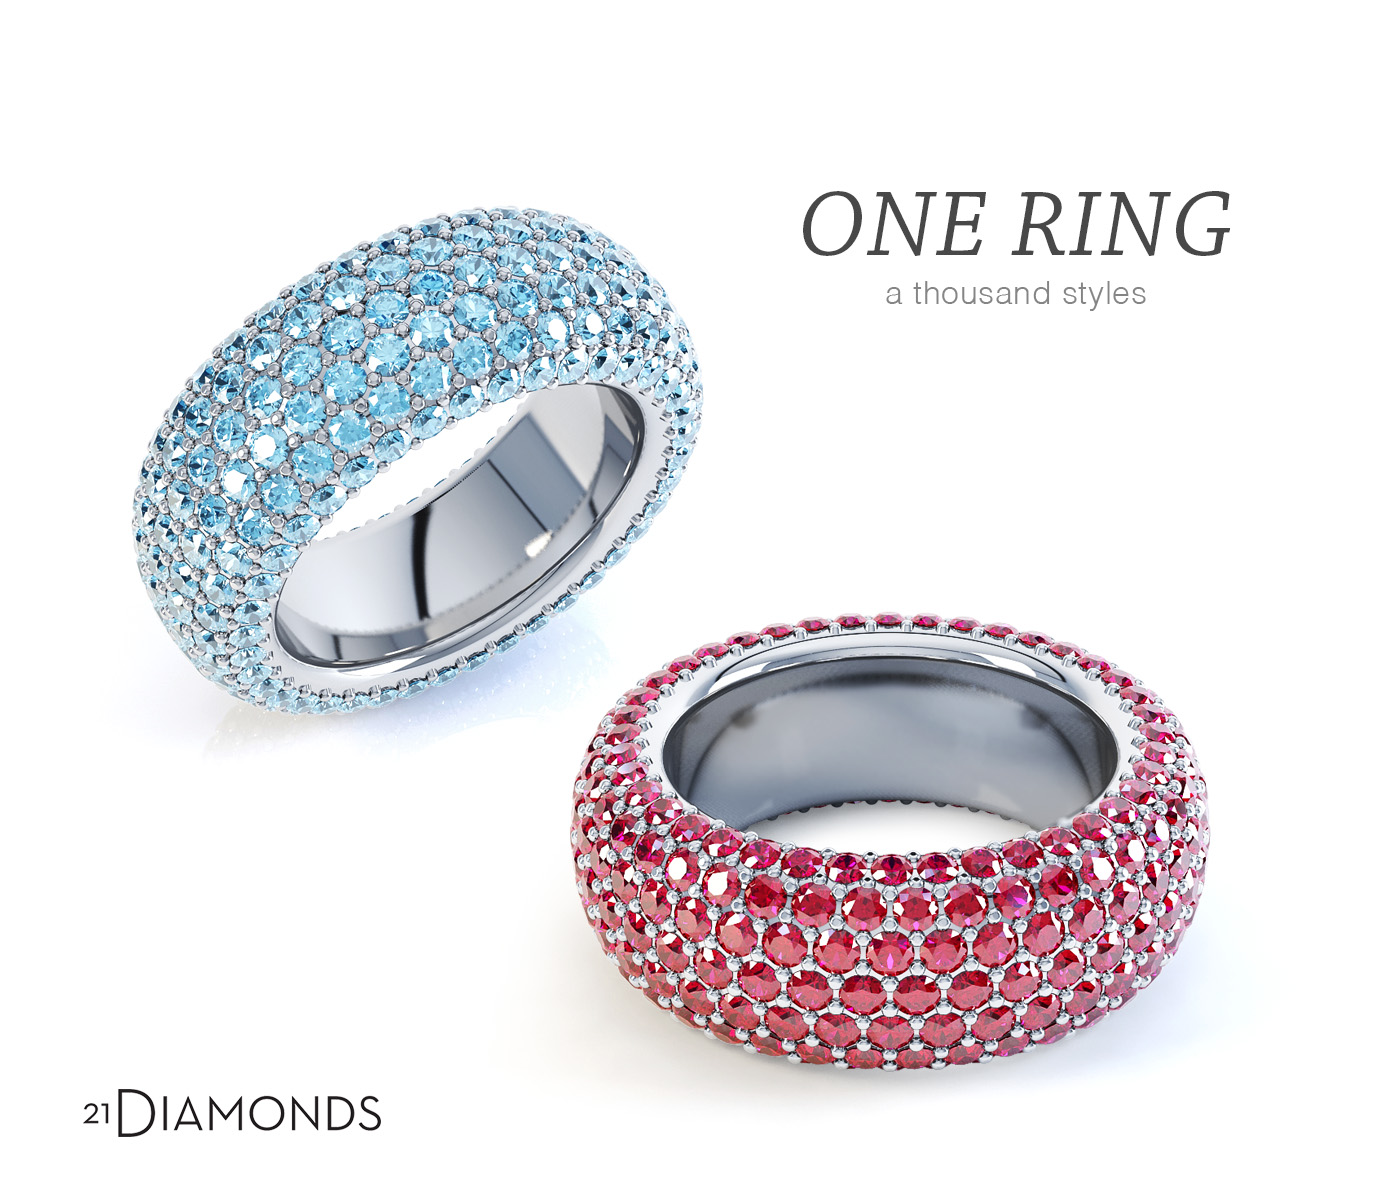 21_Diamonds_jewellery_rendering.jpg